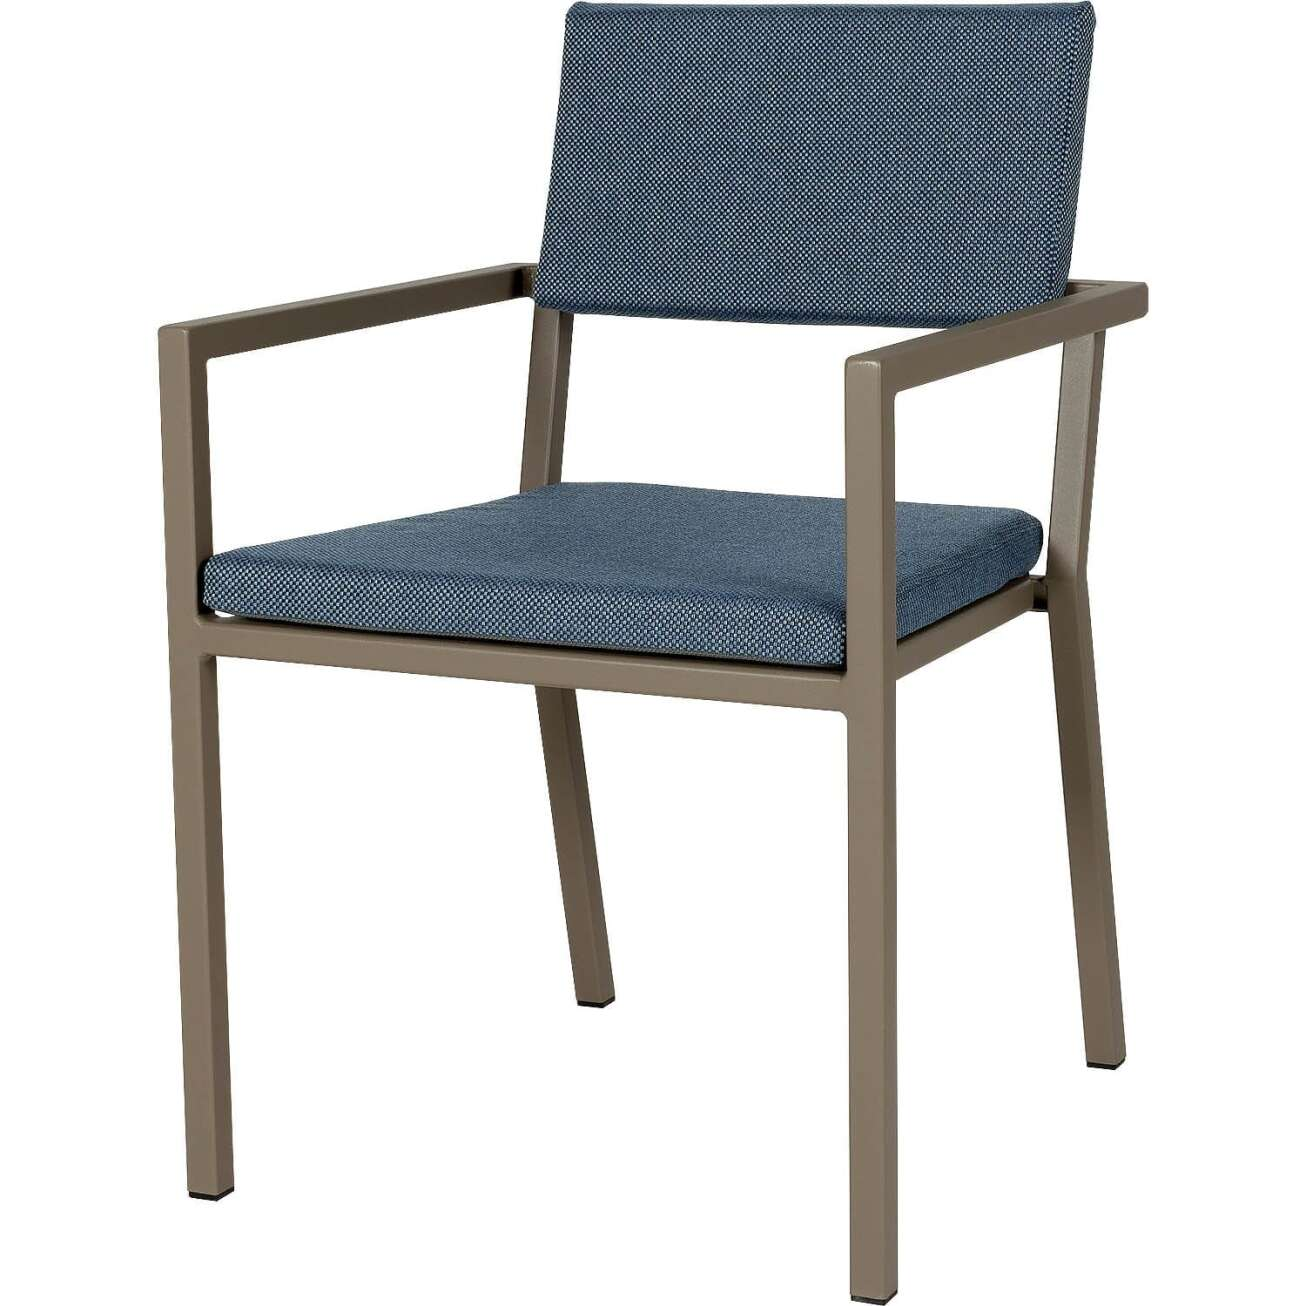 Sundays Frame spisestol i brun aluminium med blå puter